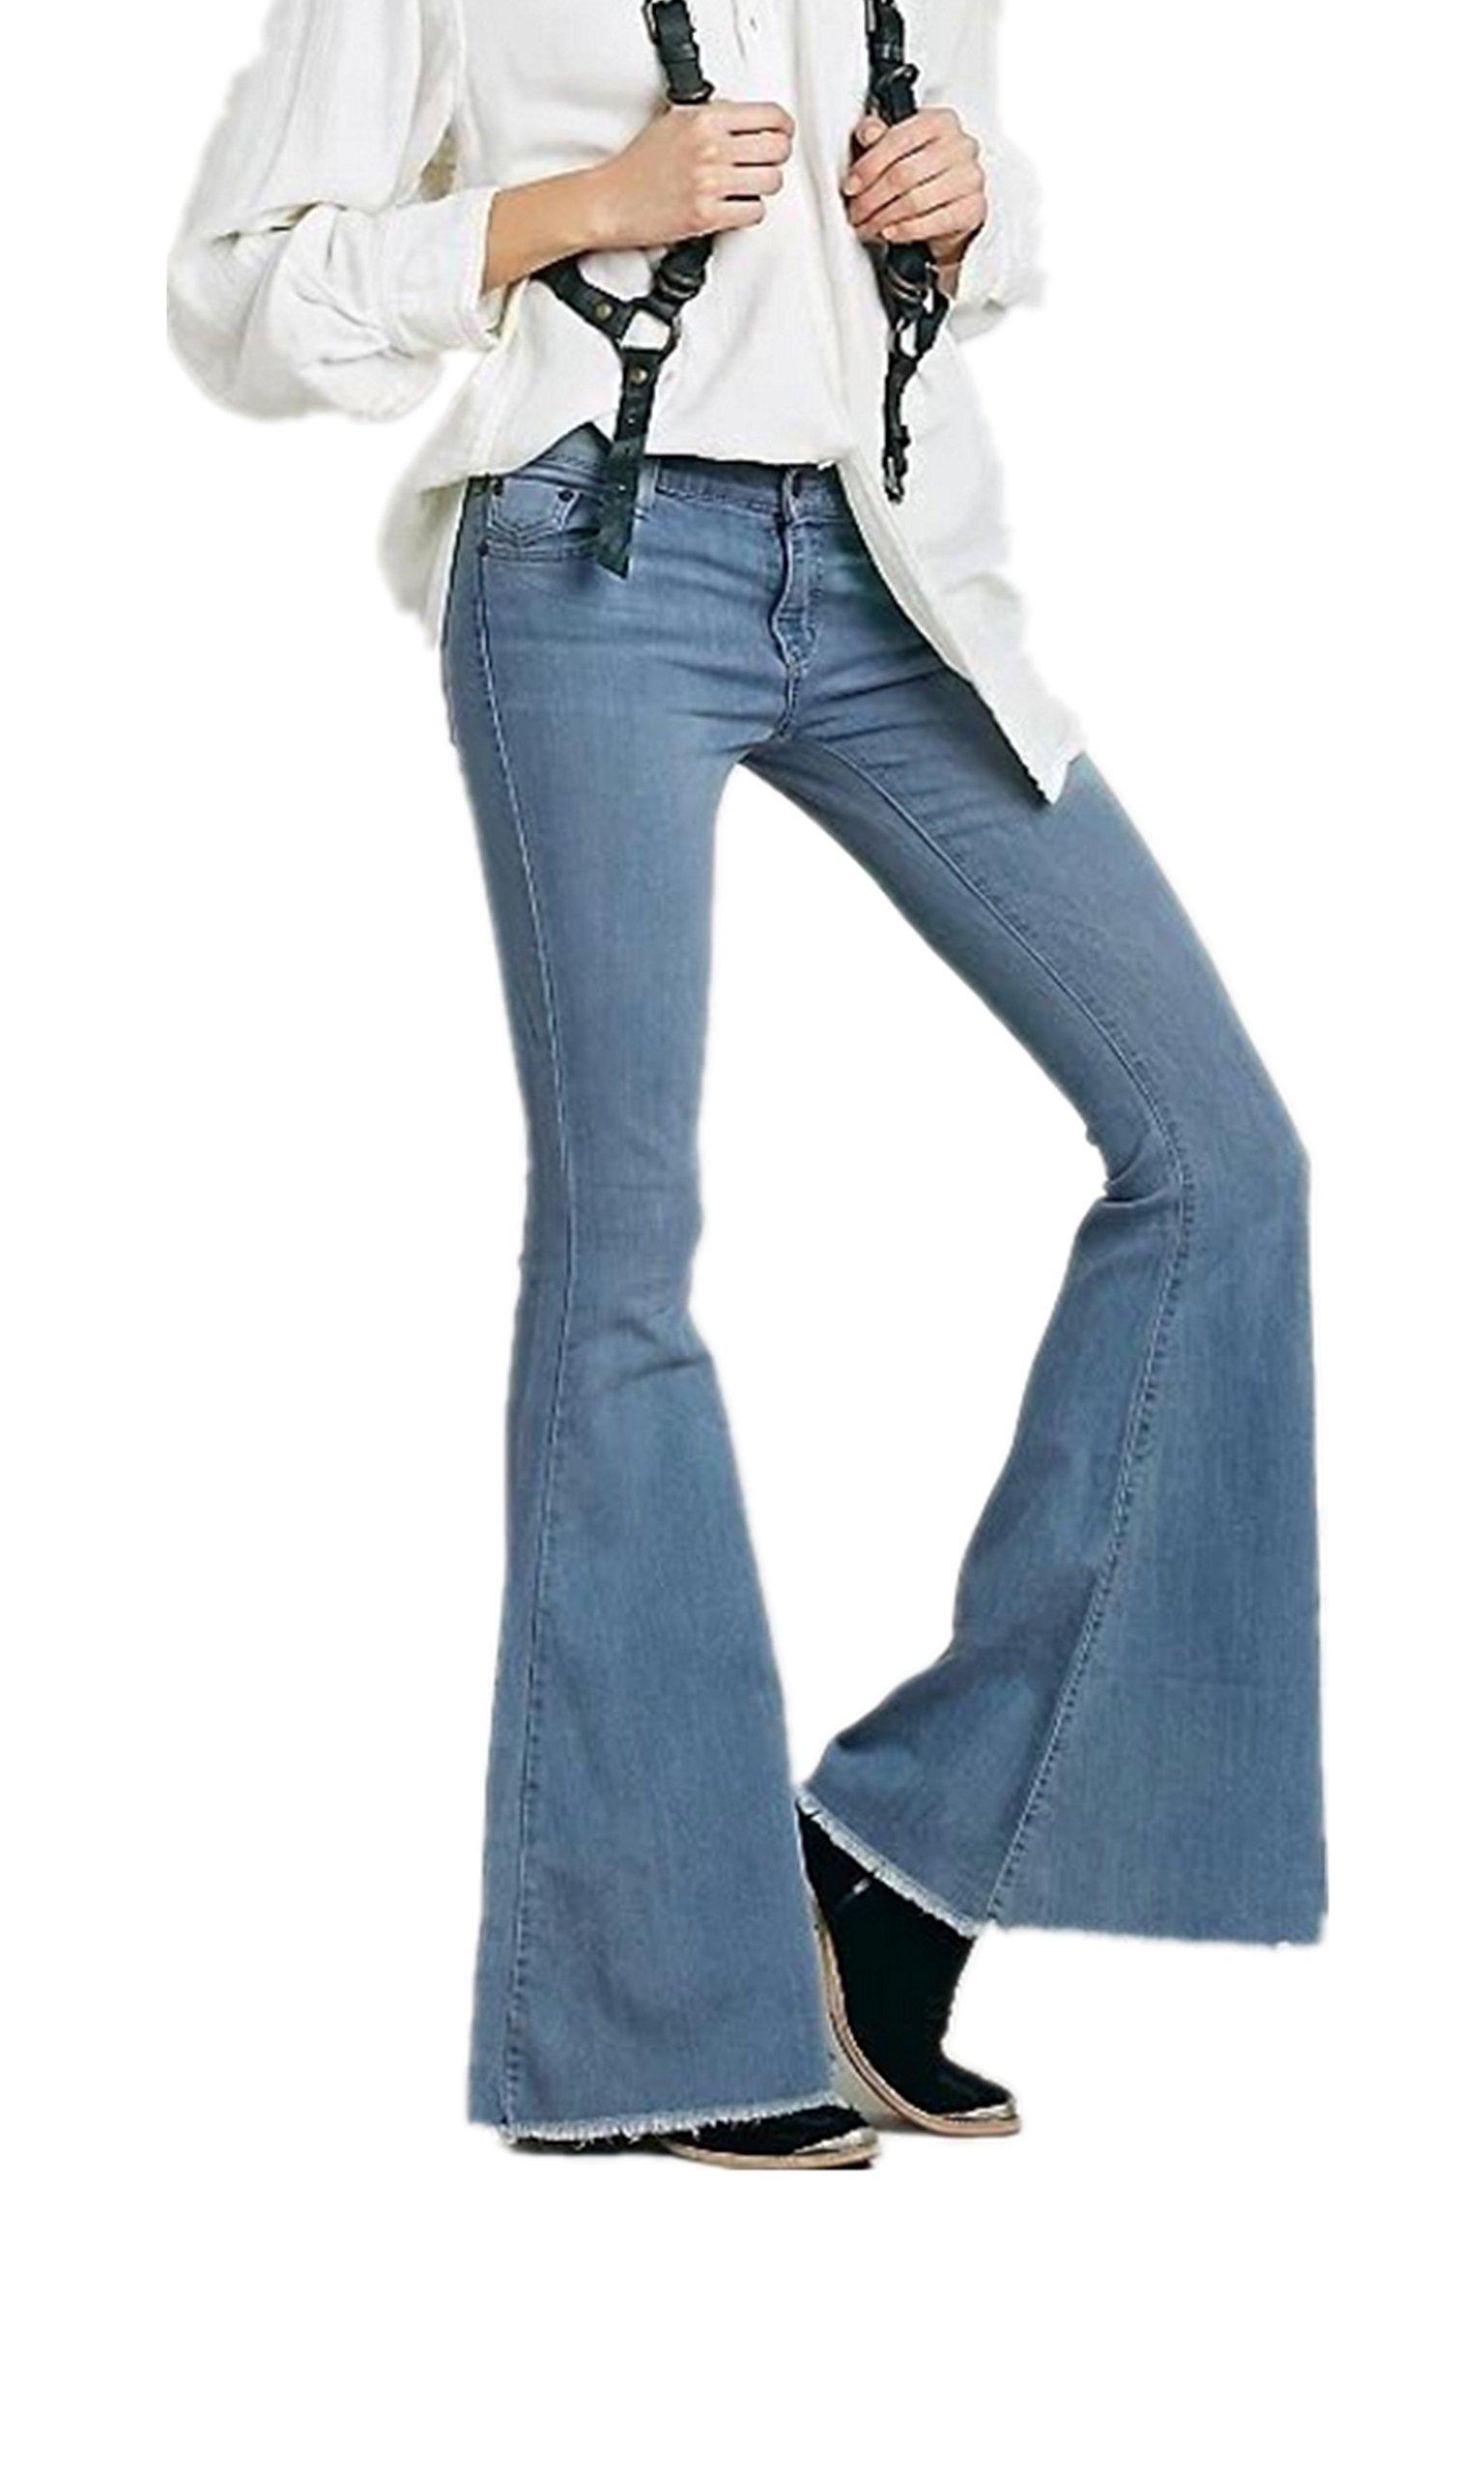 Women's Juniors Bell Bottom High Waisted Fitted Flared Denim Jeans Pants (US 0, Light Blue 1)